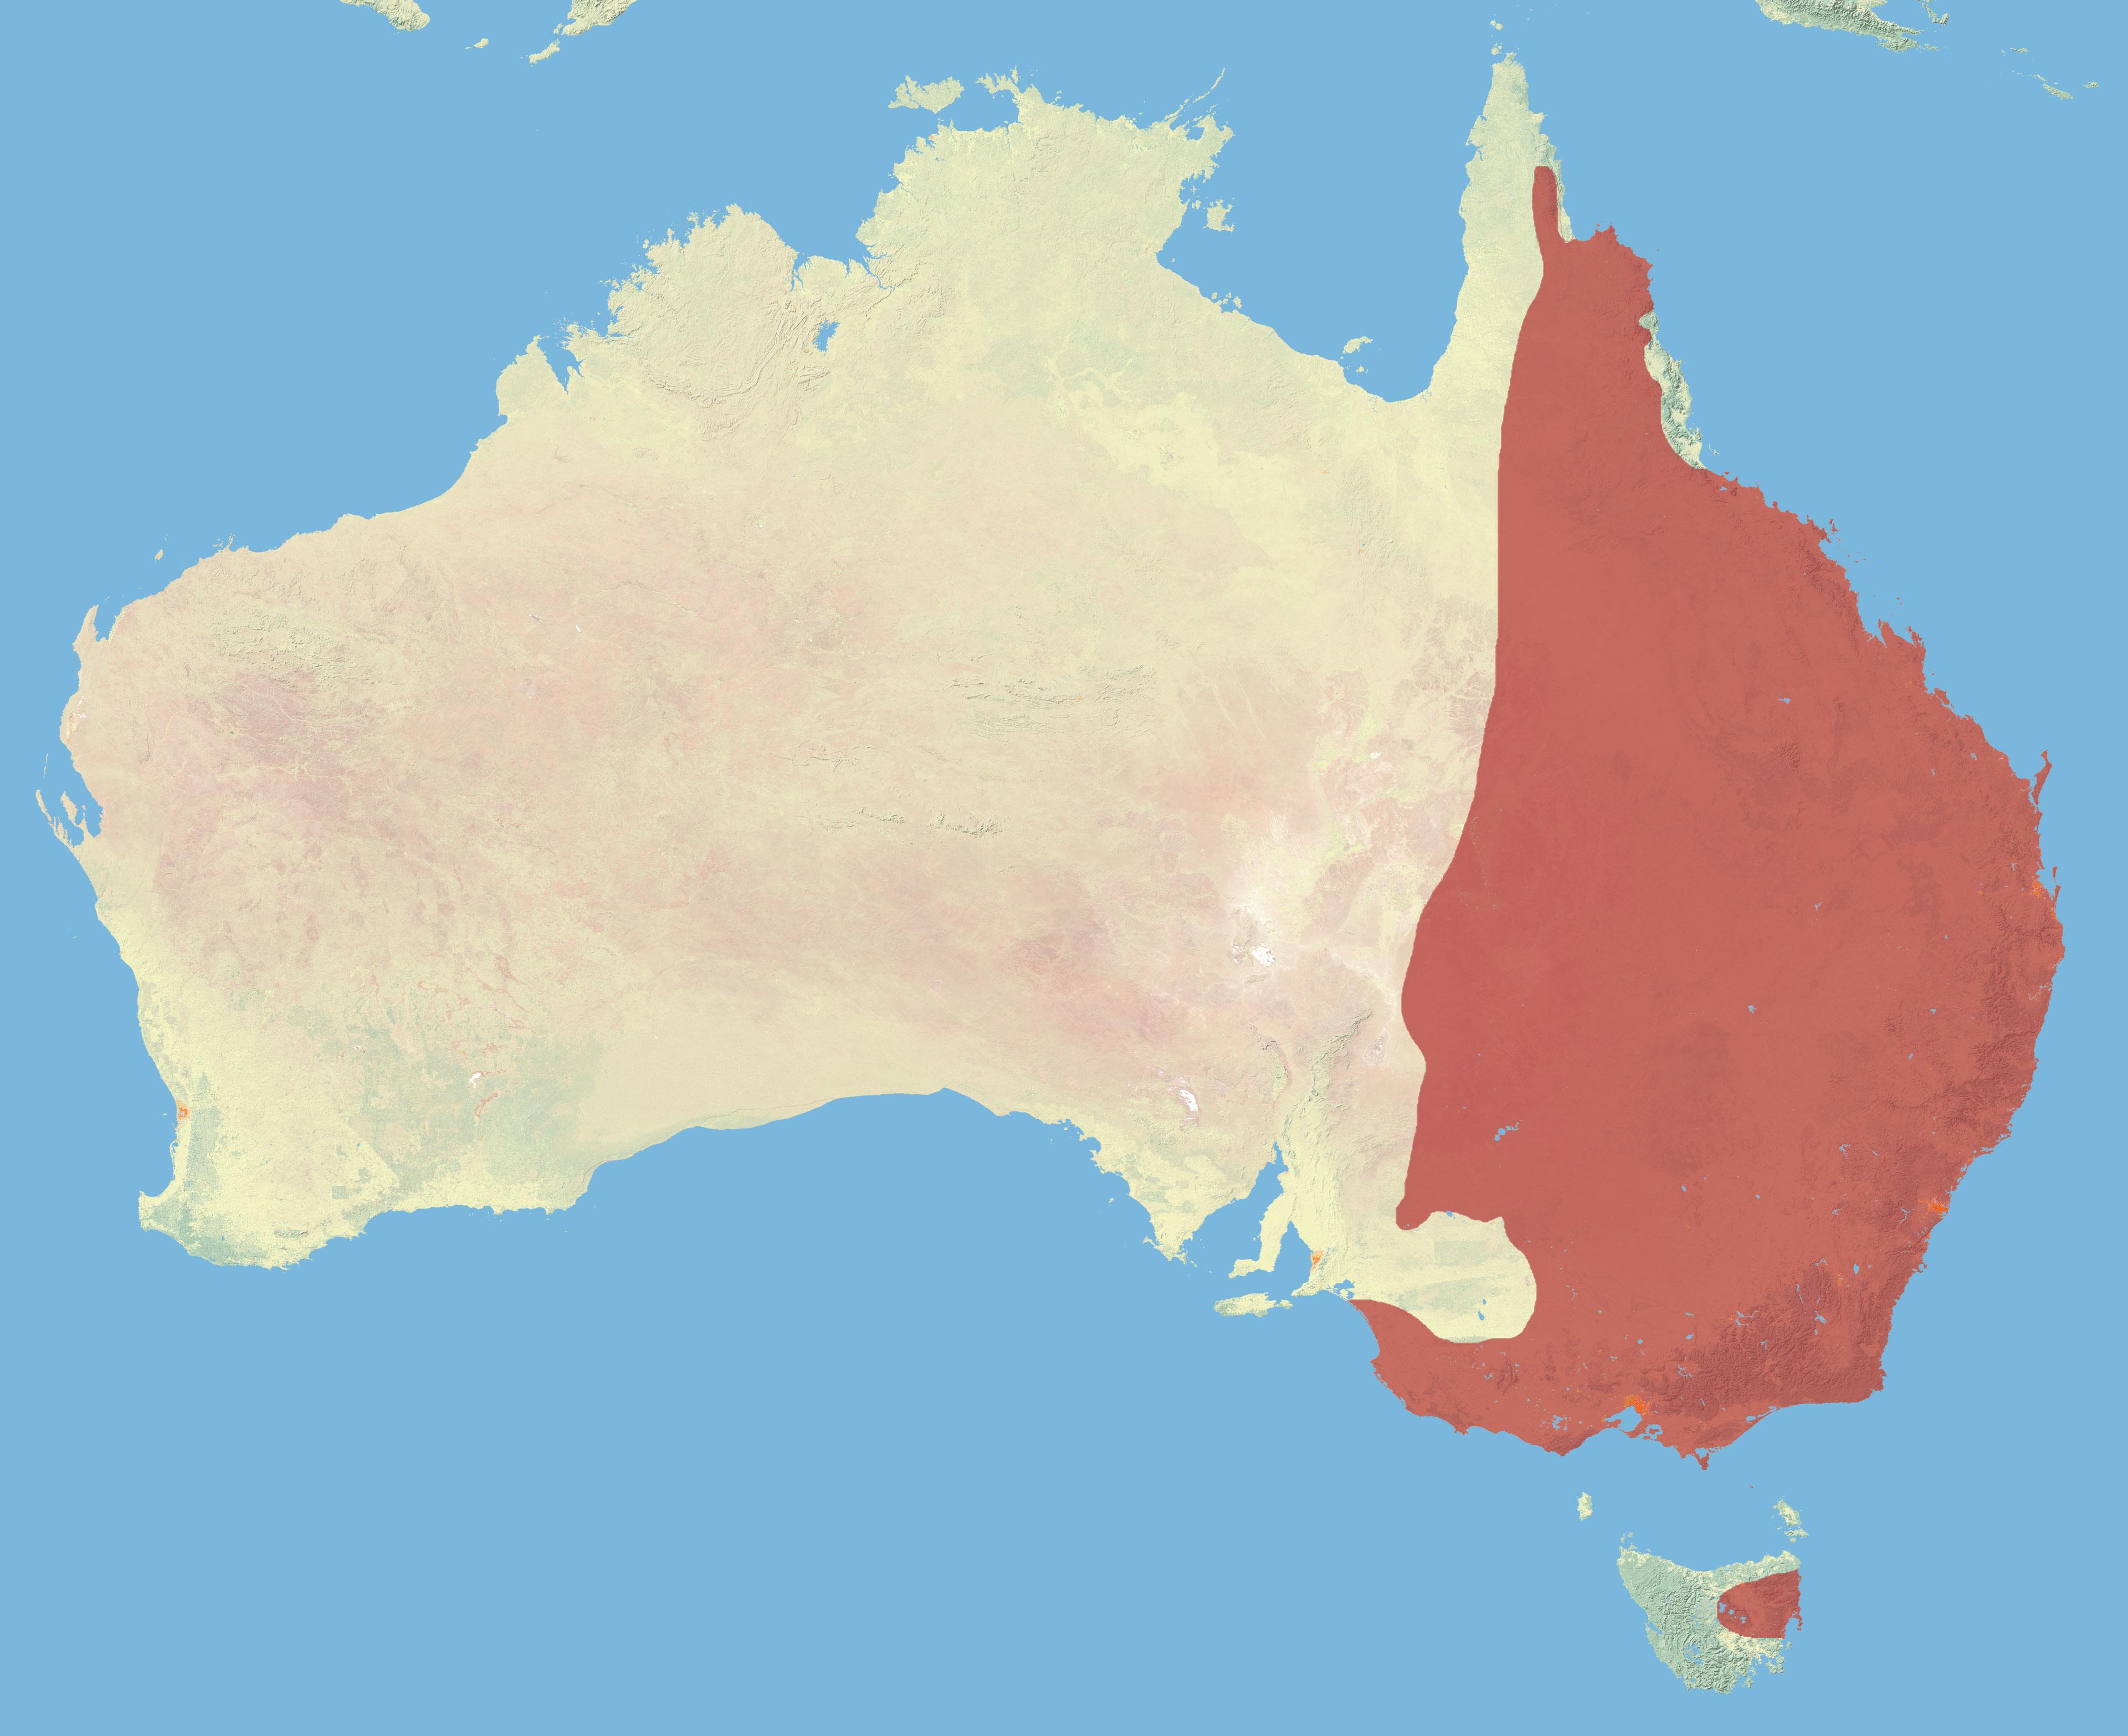 Kangaroo Distribution In Australia Vs Elevation OC Dataisbeautiful - Australia map kangaroo